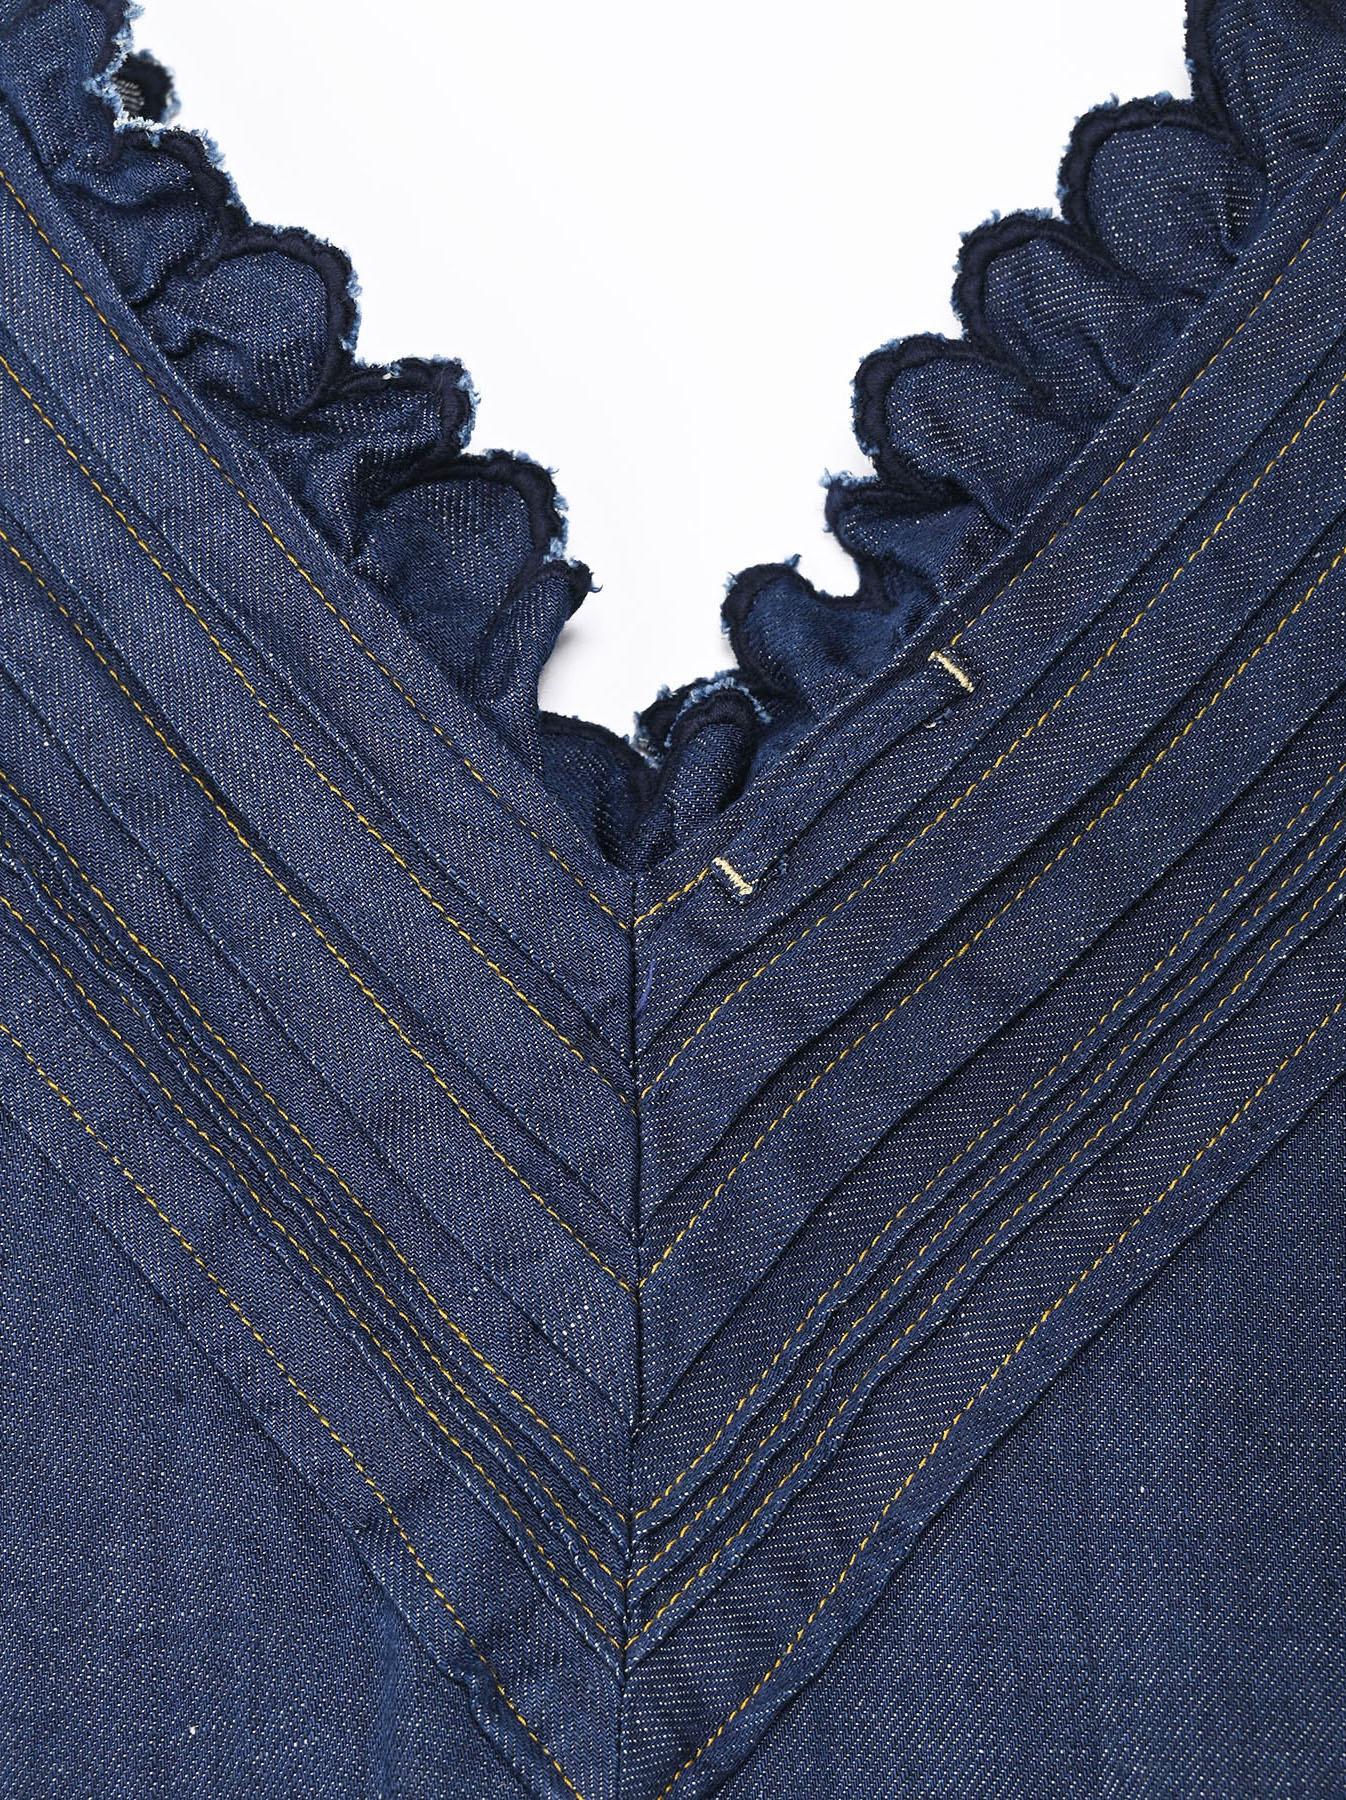 Komugi Denim Tuck Lace Dress-7